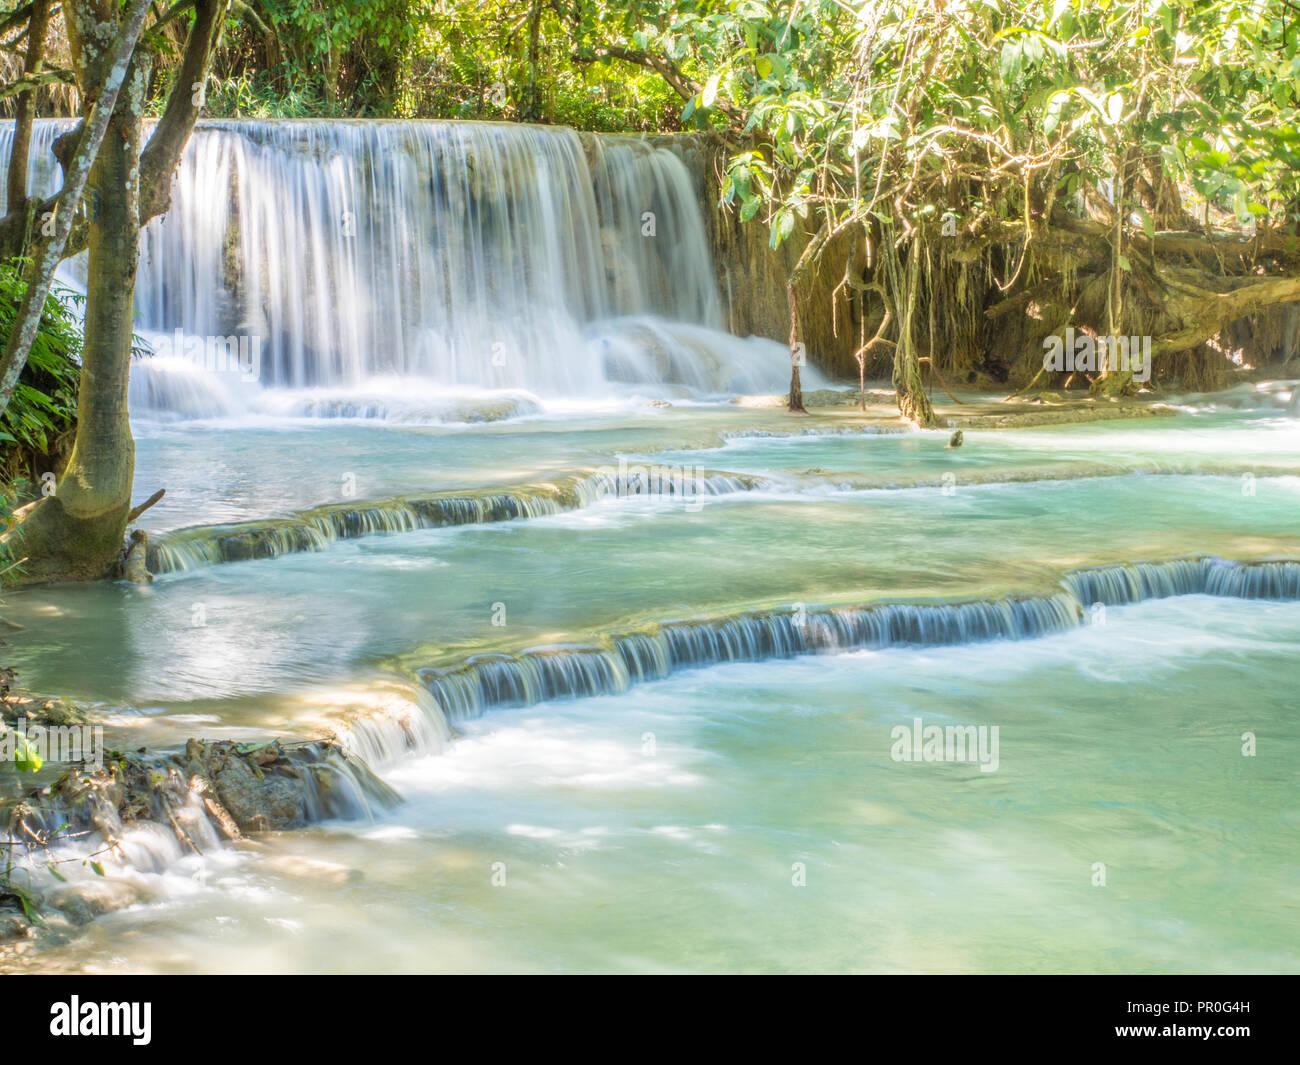 Keang Si waterfall, Luang Prabang, Laos, Indochina, Southeast Asia, Asia - Stock Image